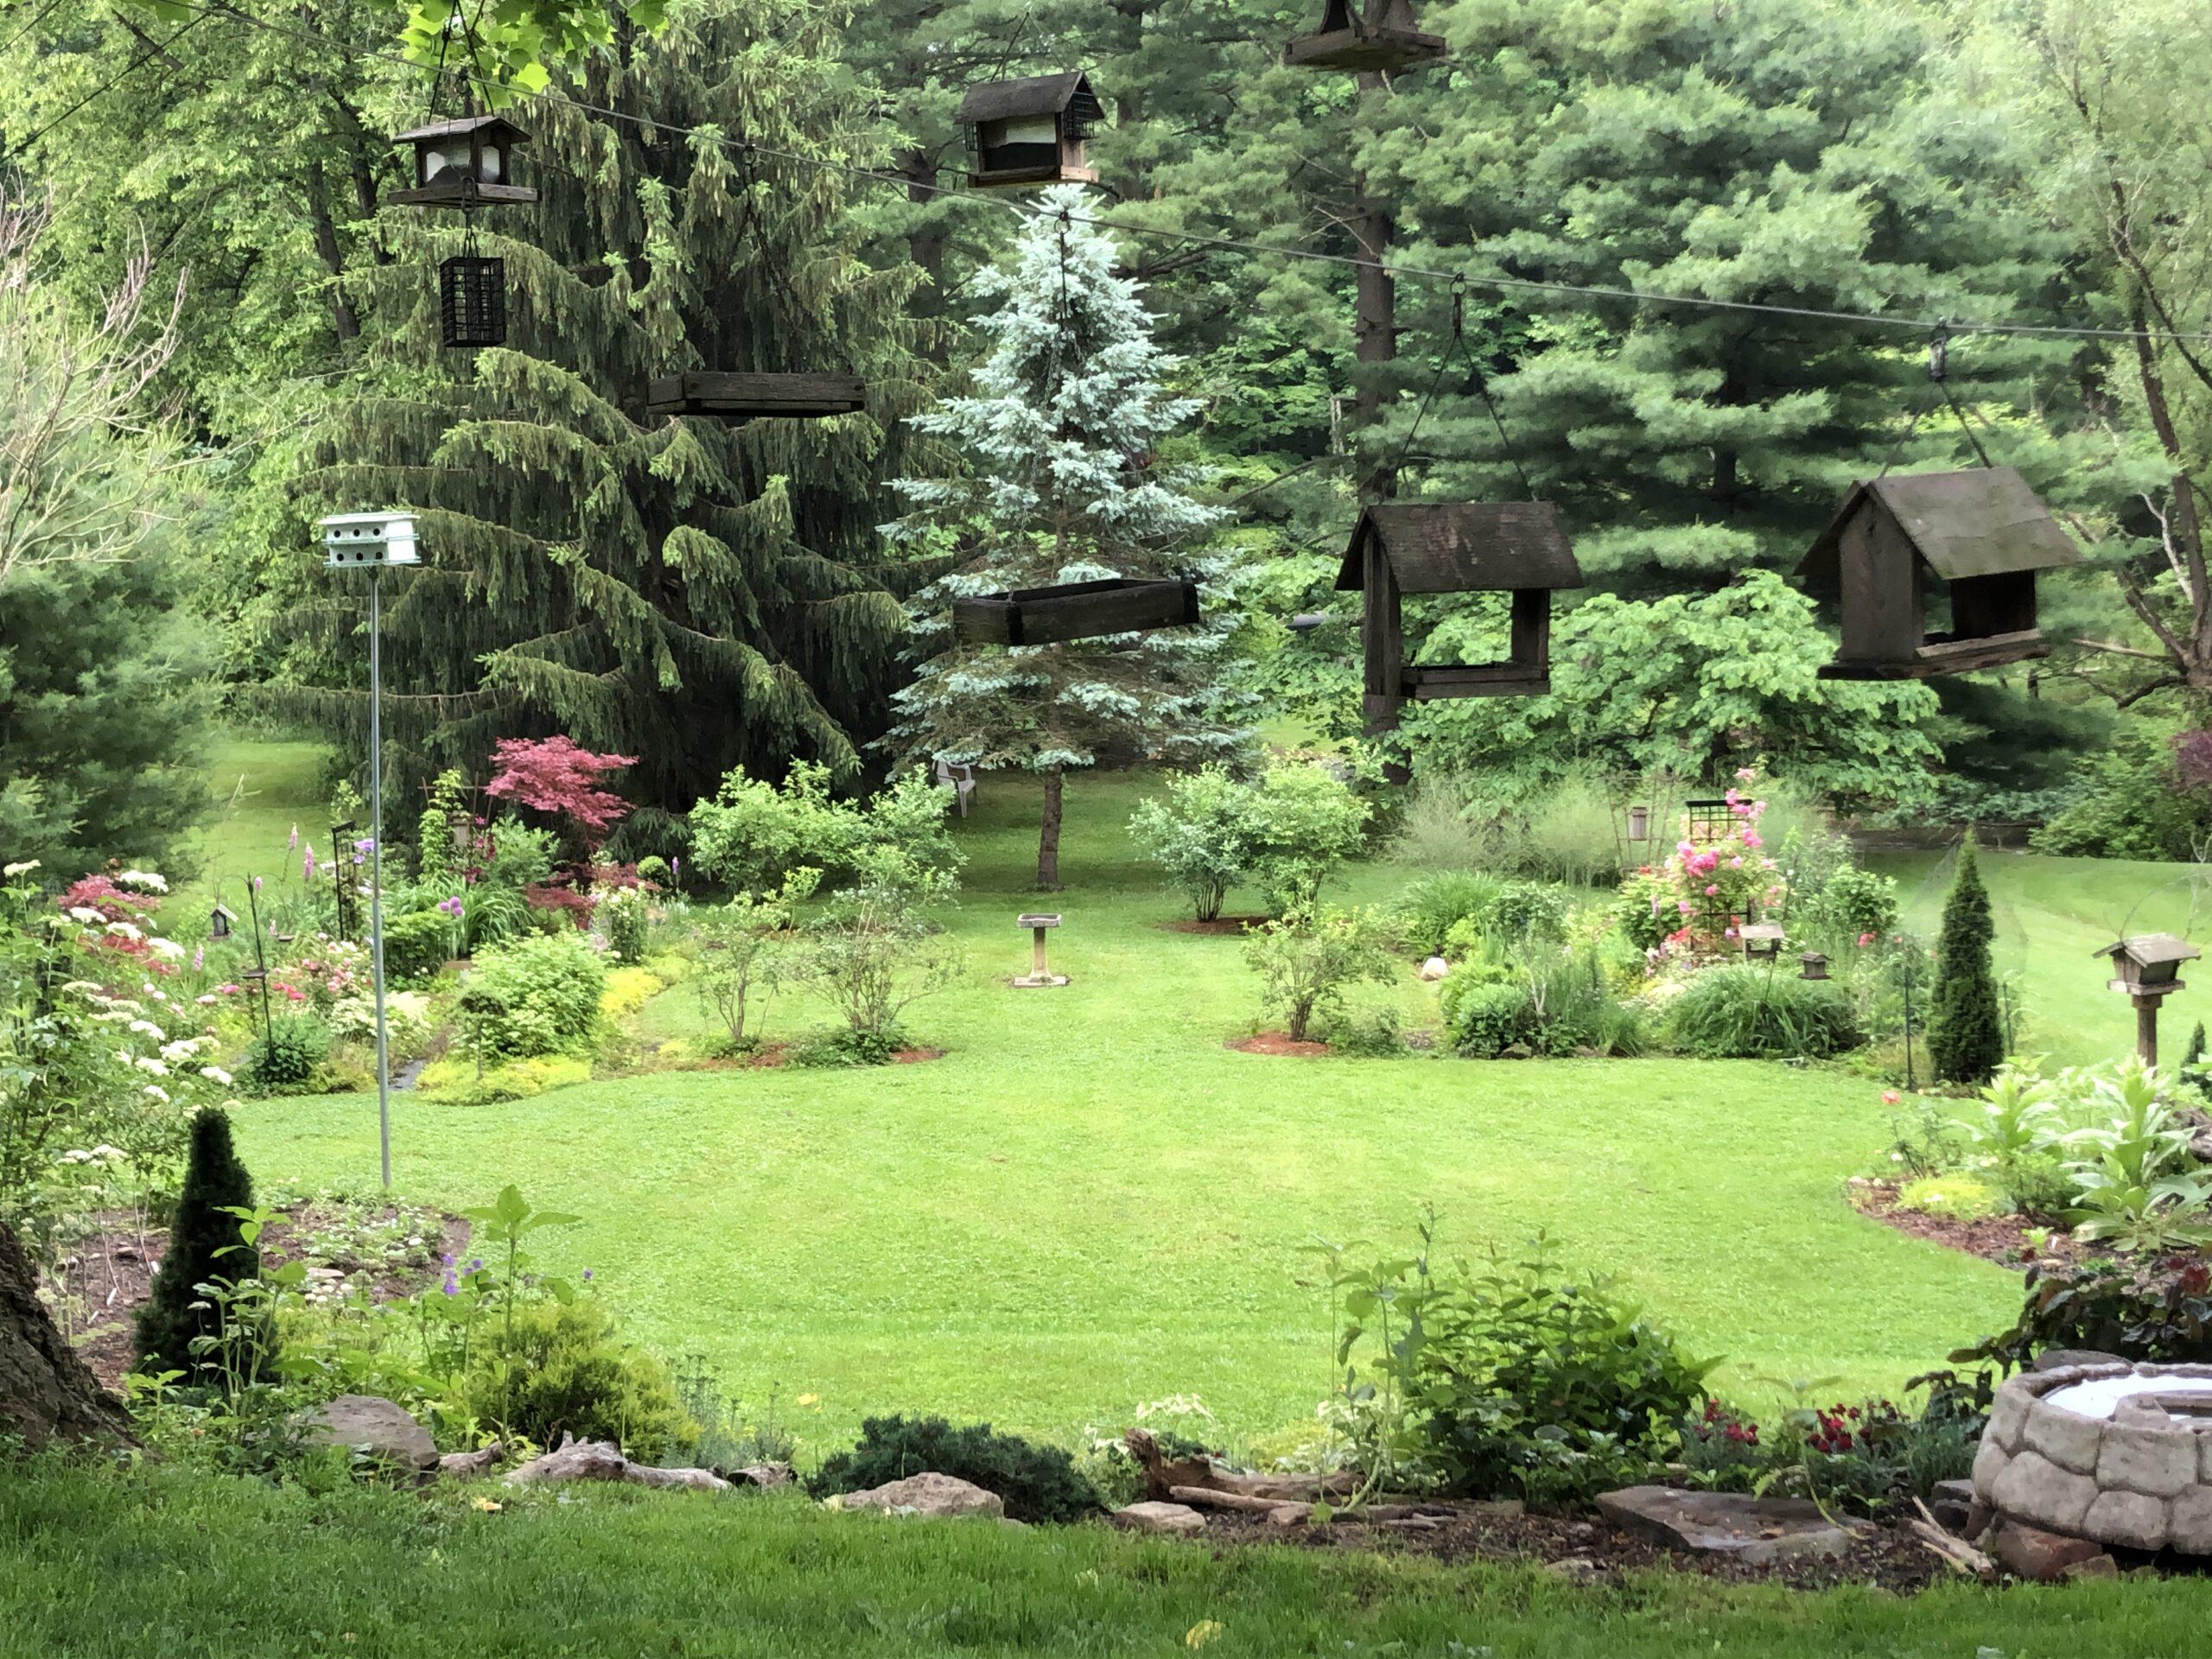 wide video of the full garden